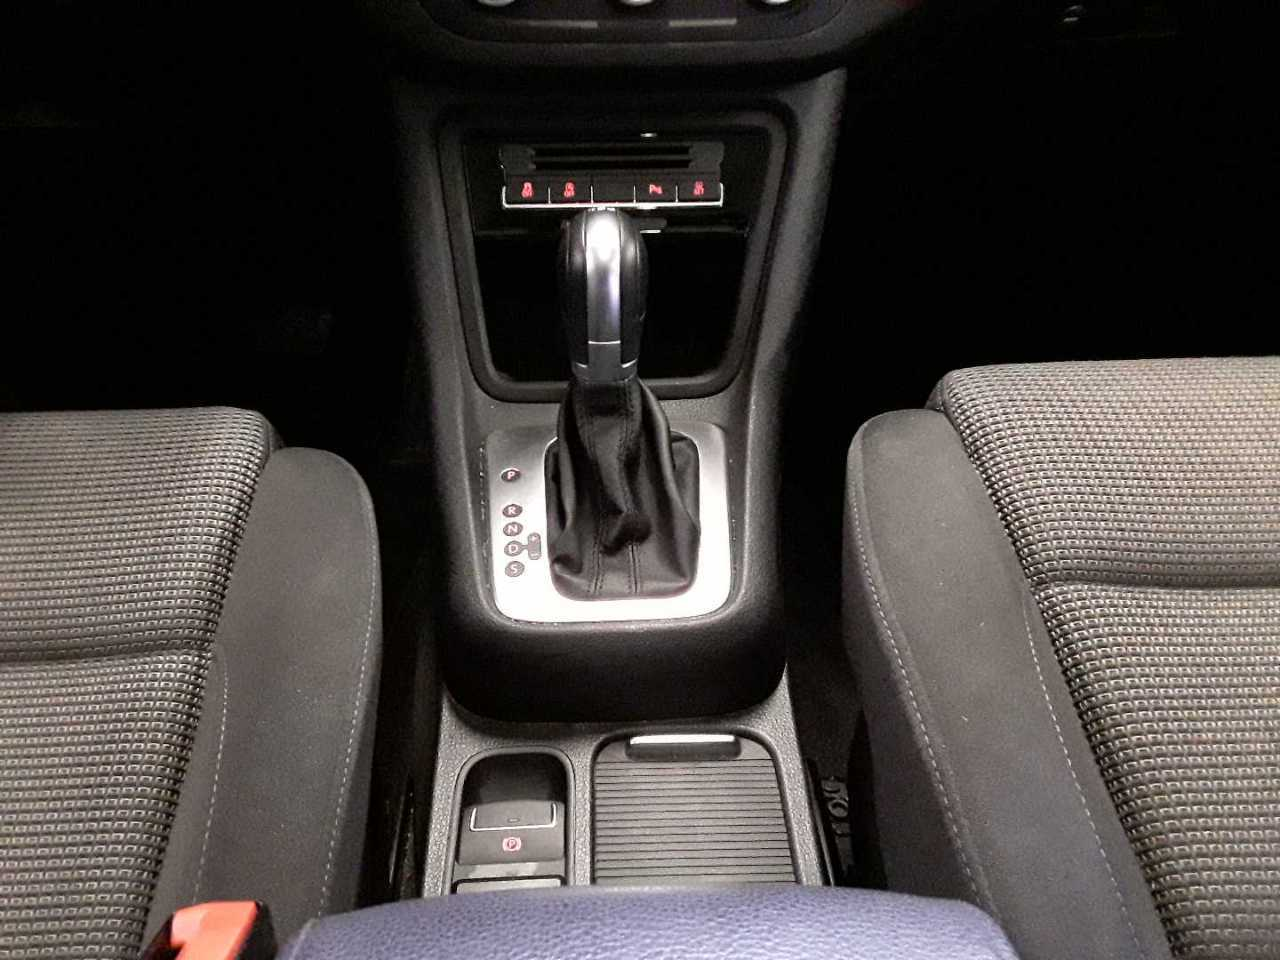 VW Sharan 2.0 TDI DSG Comfortline Navi AHK